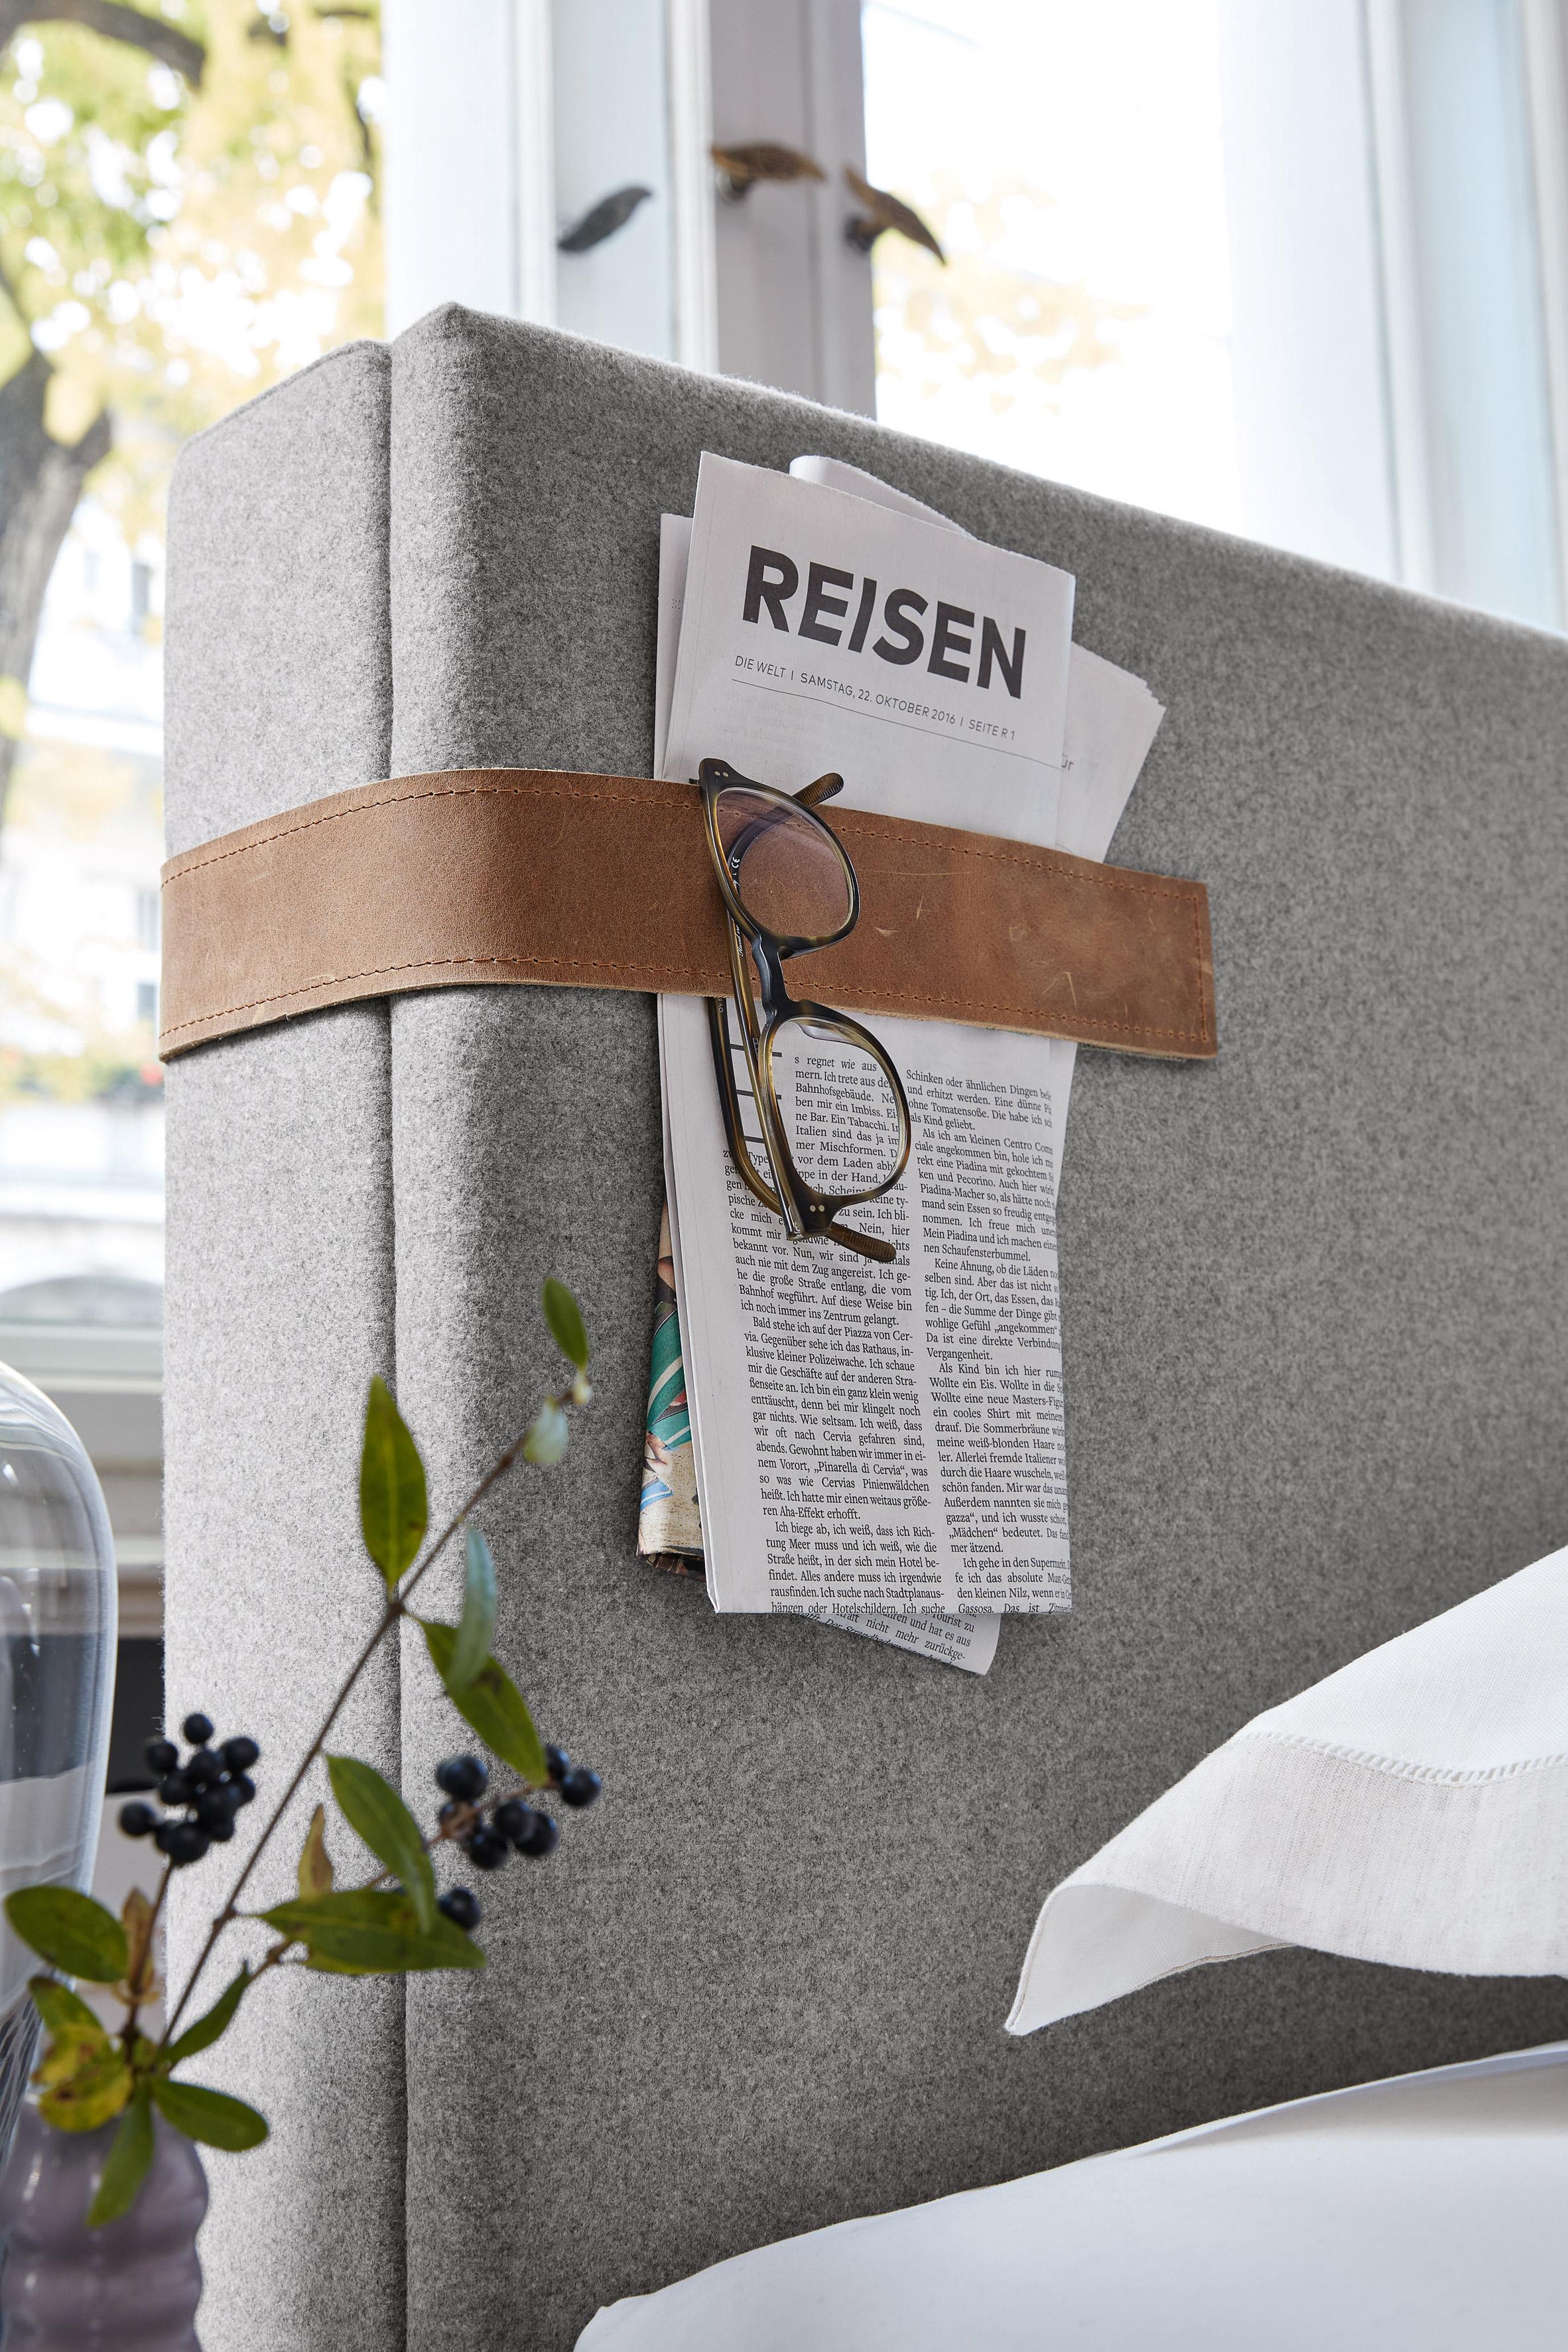 imm-cologne-2017-design-furniture-beds-birkenstock_dezeen_2364_col_6